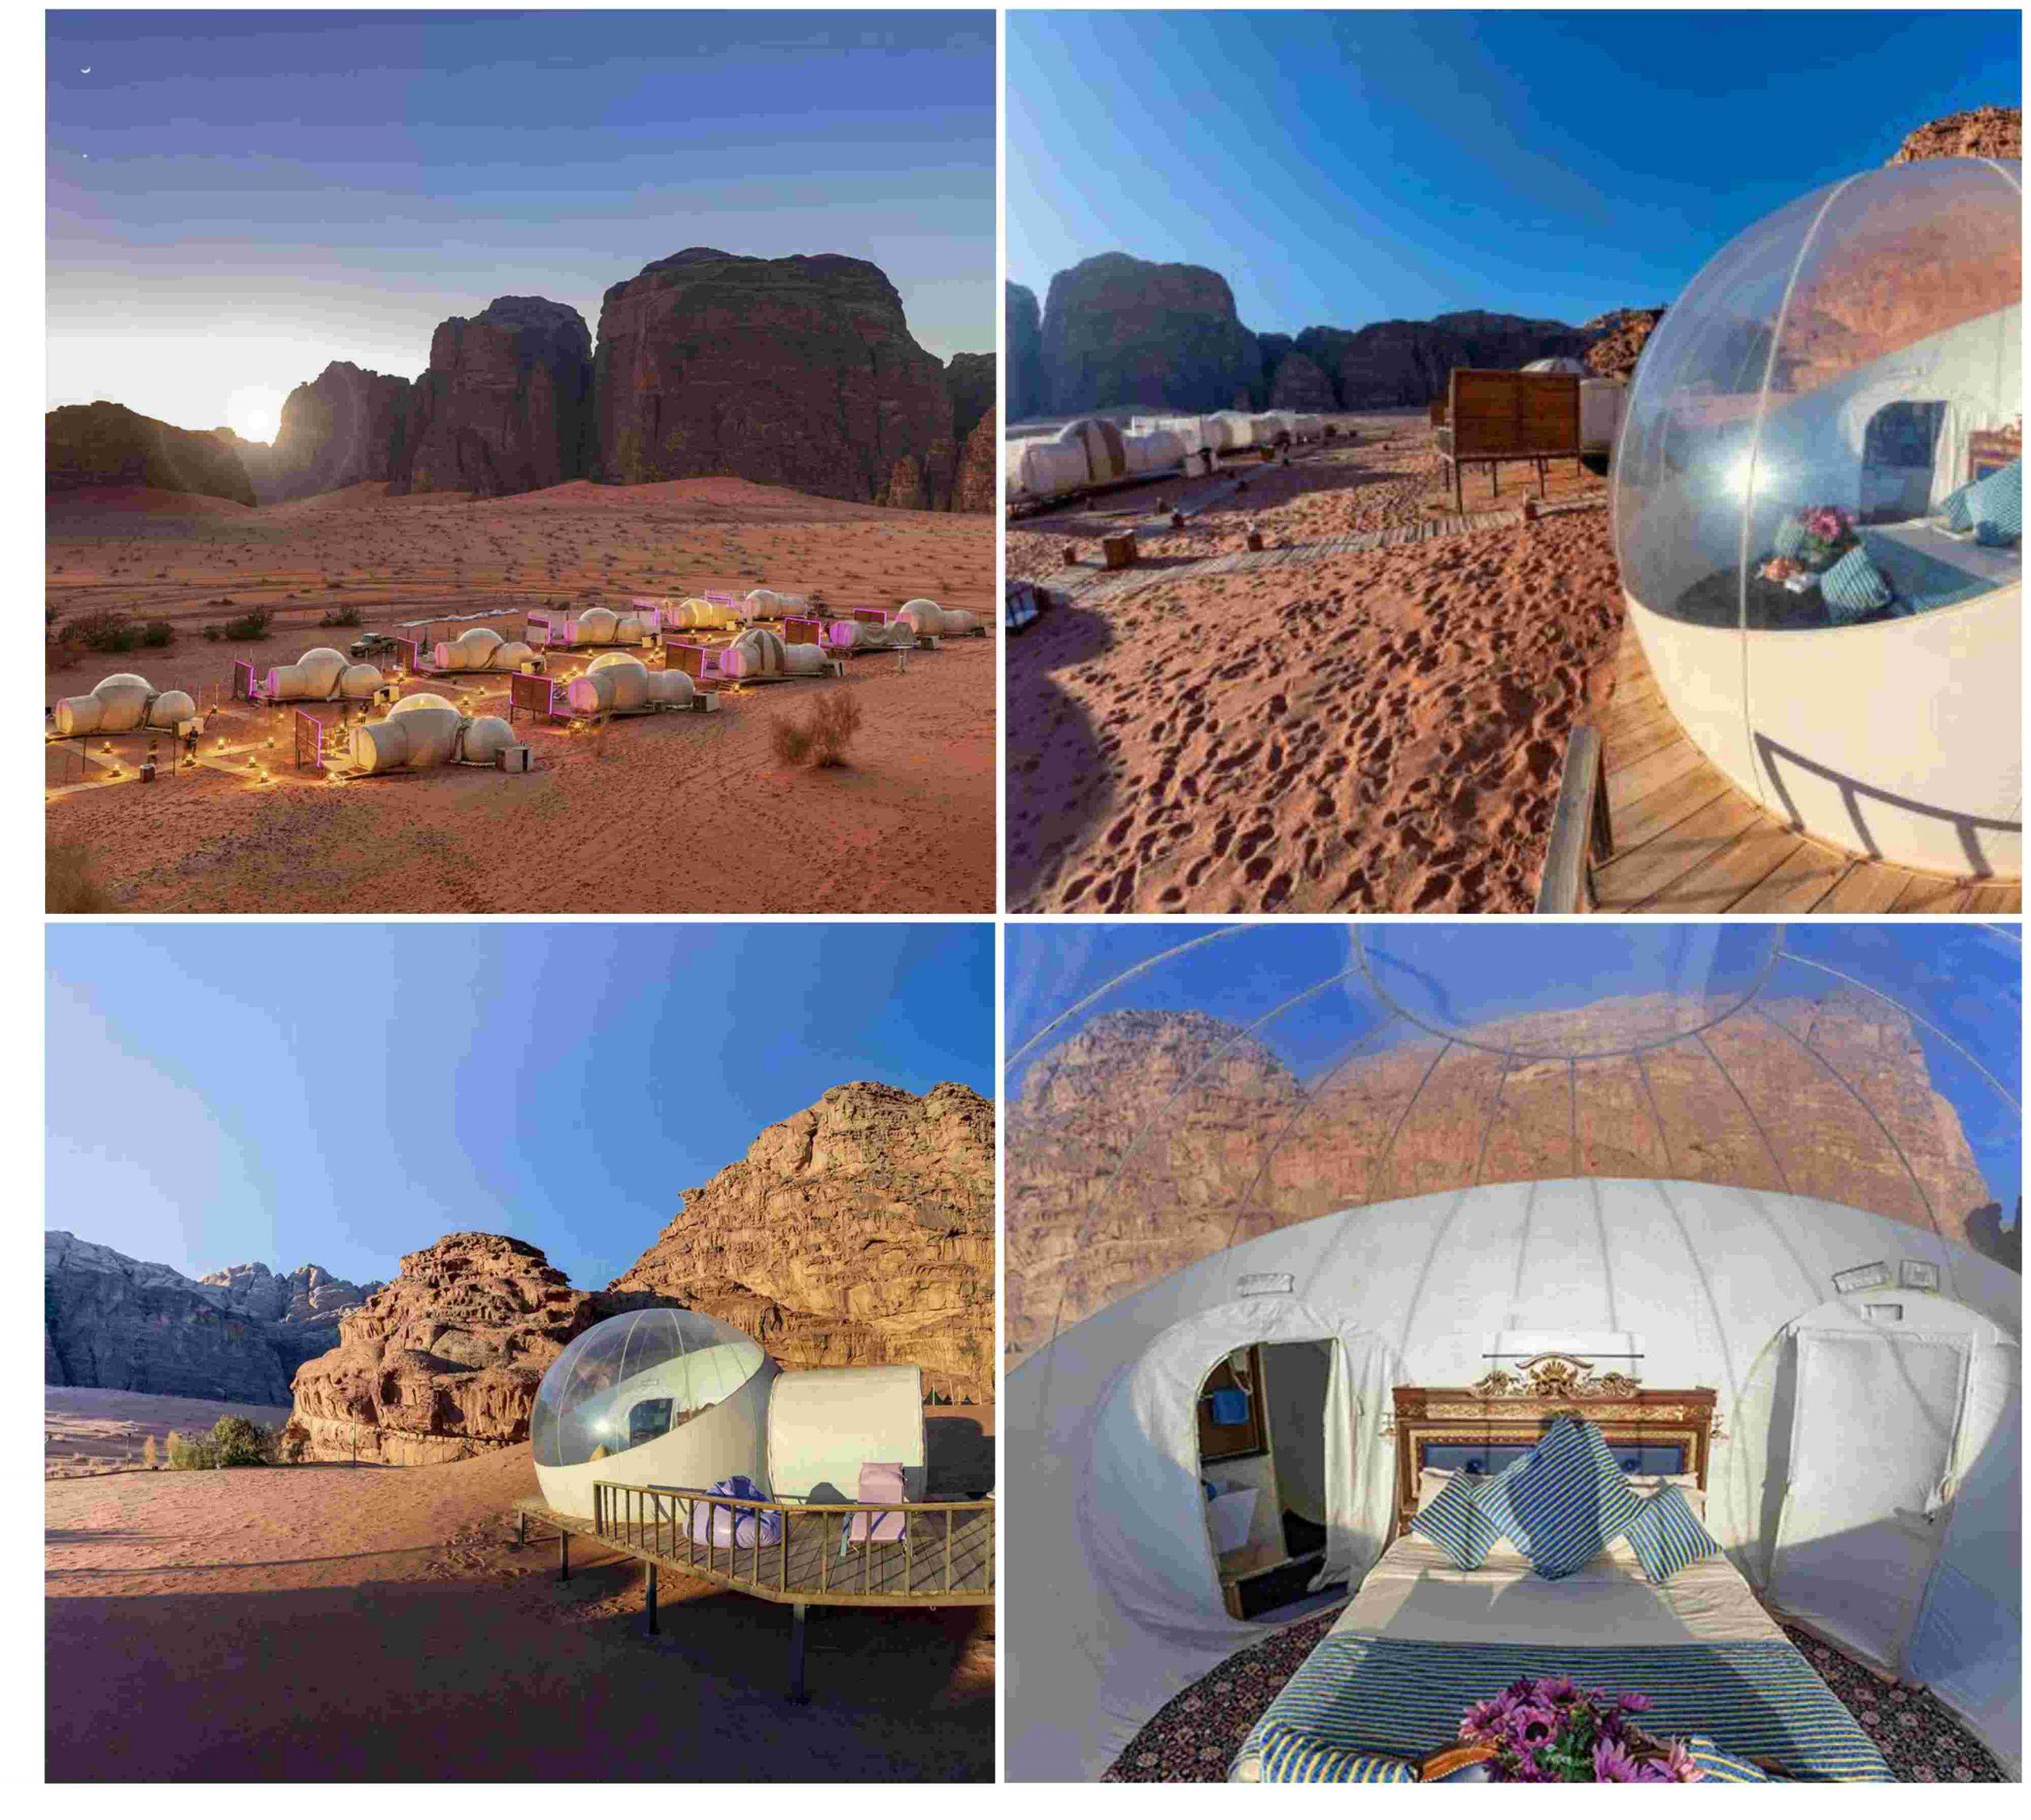 destinos-glamping-bubble-tent-desierto-de-wadi-rum-jordania